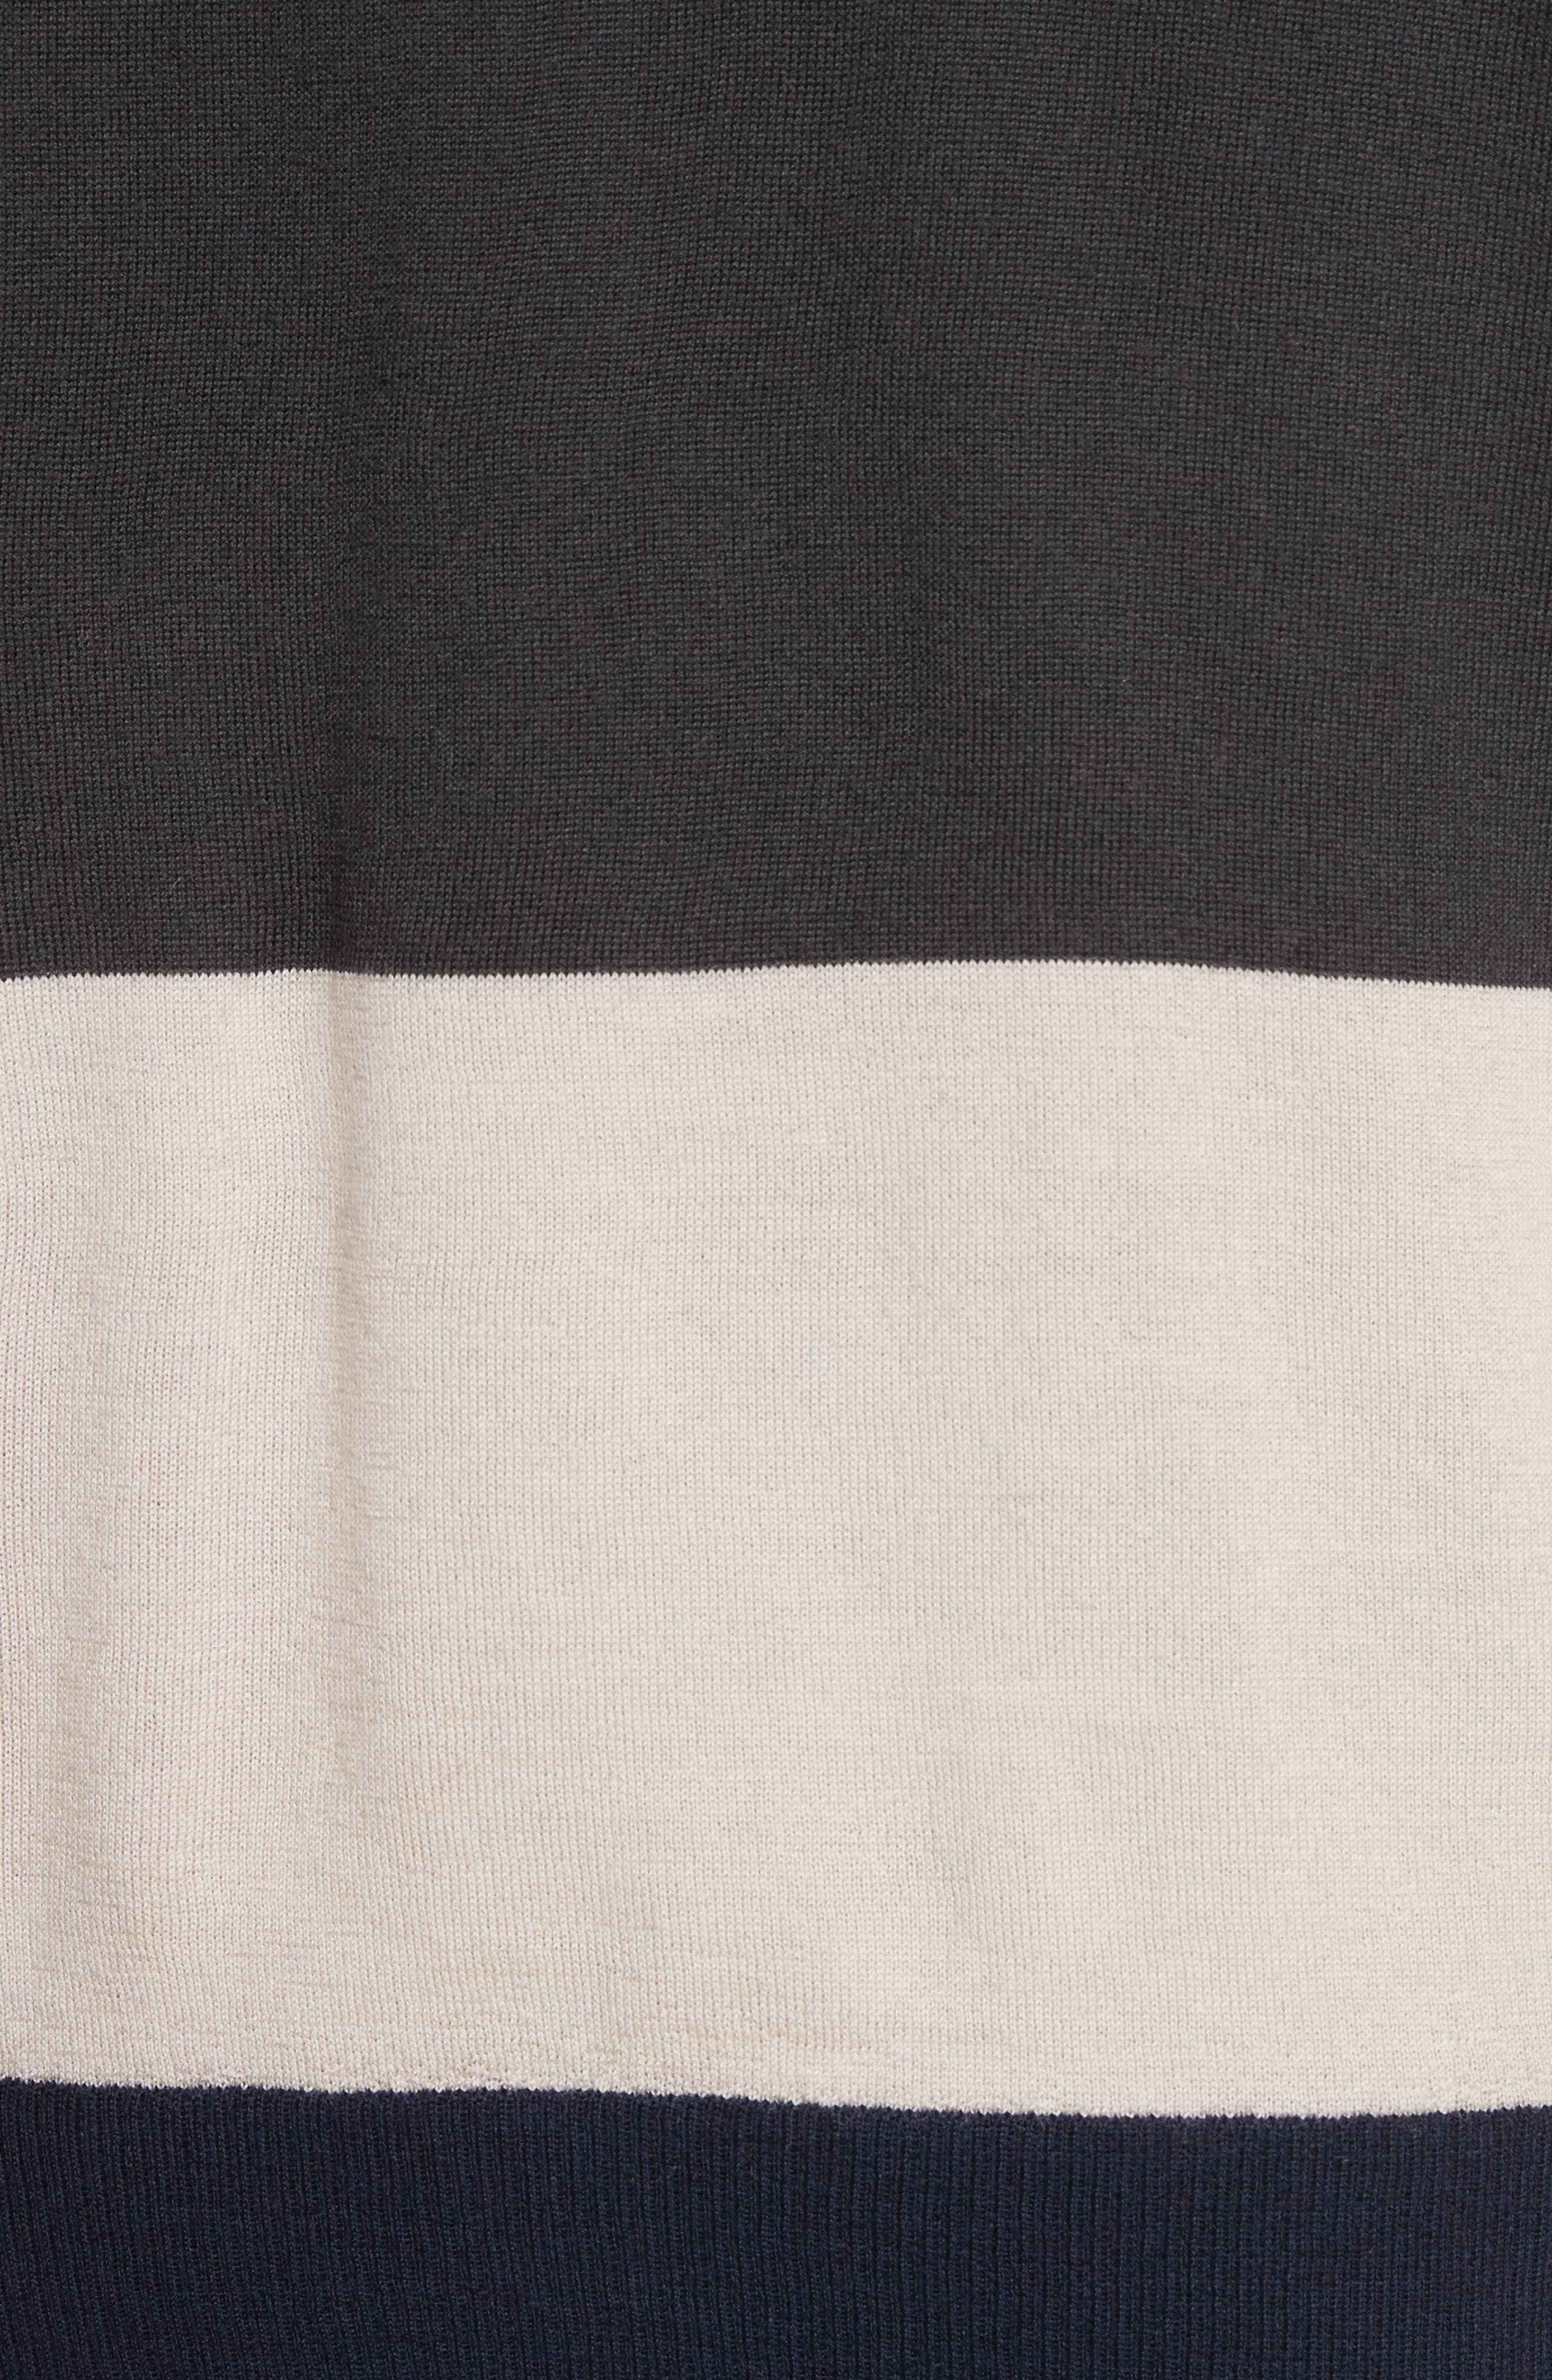 Colorblock Merino Wool Sweater,                             Alternate thumbnail 5, color,